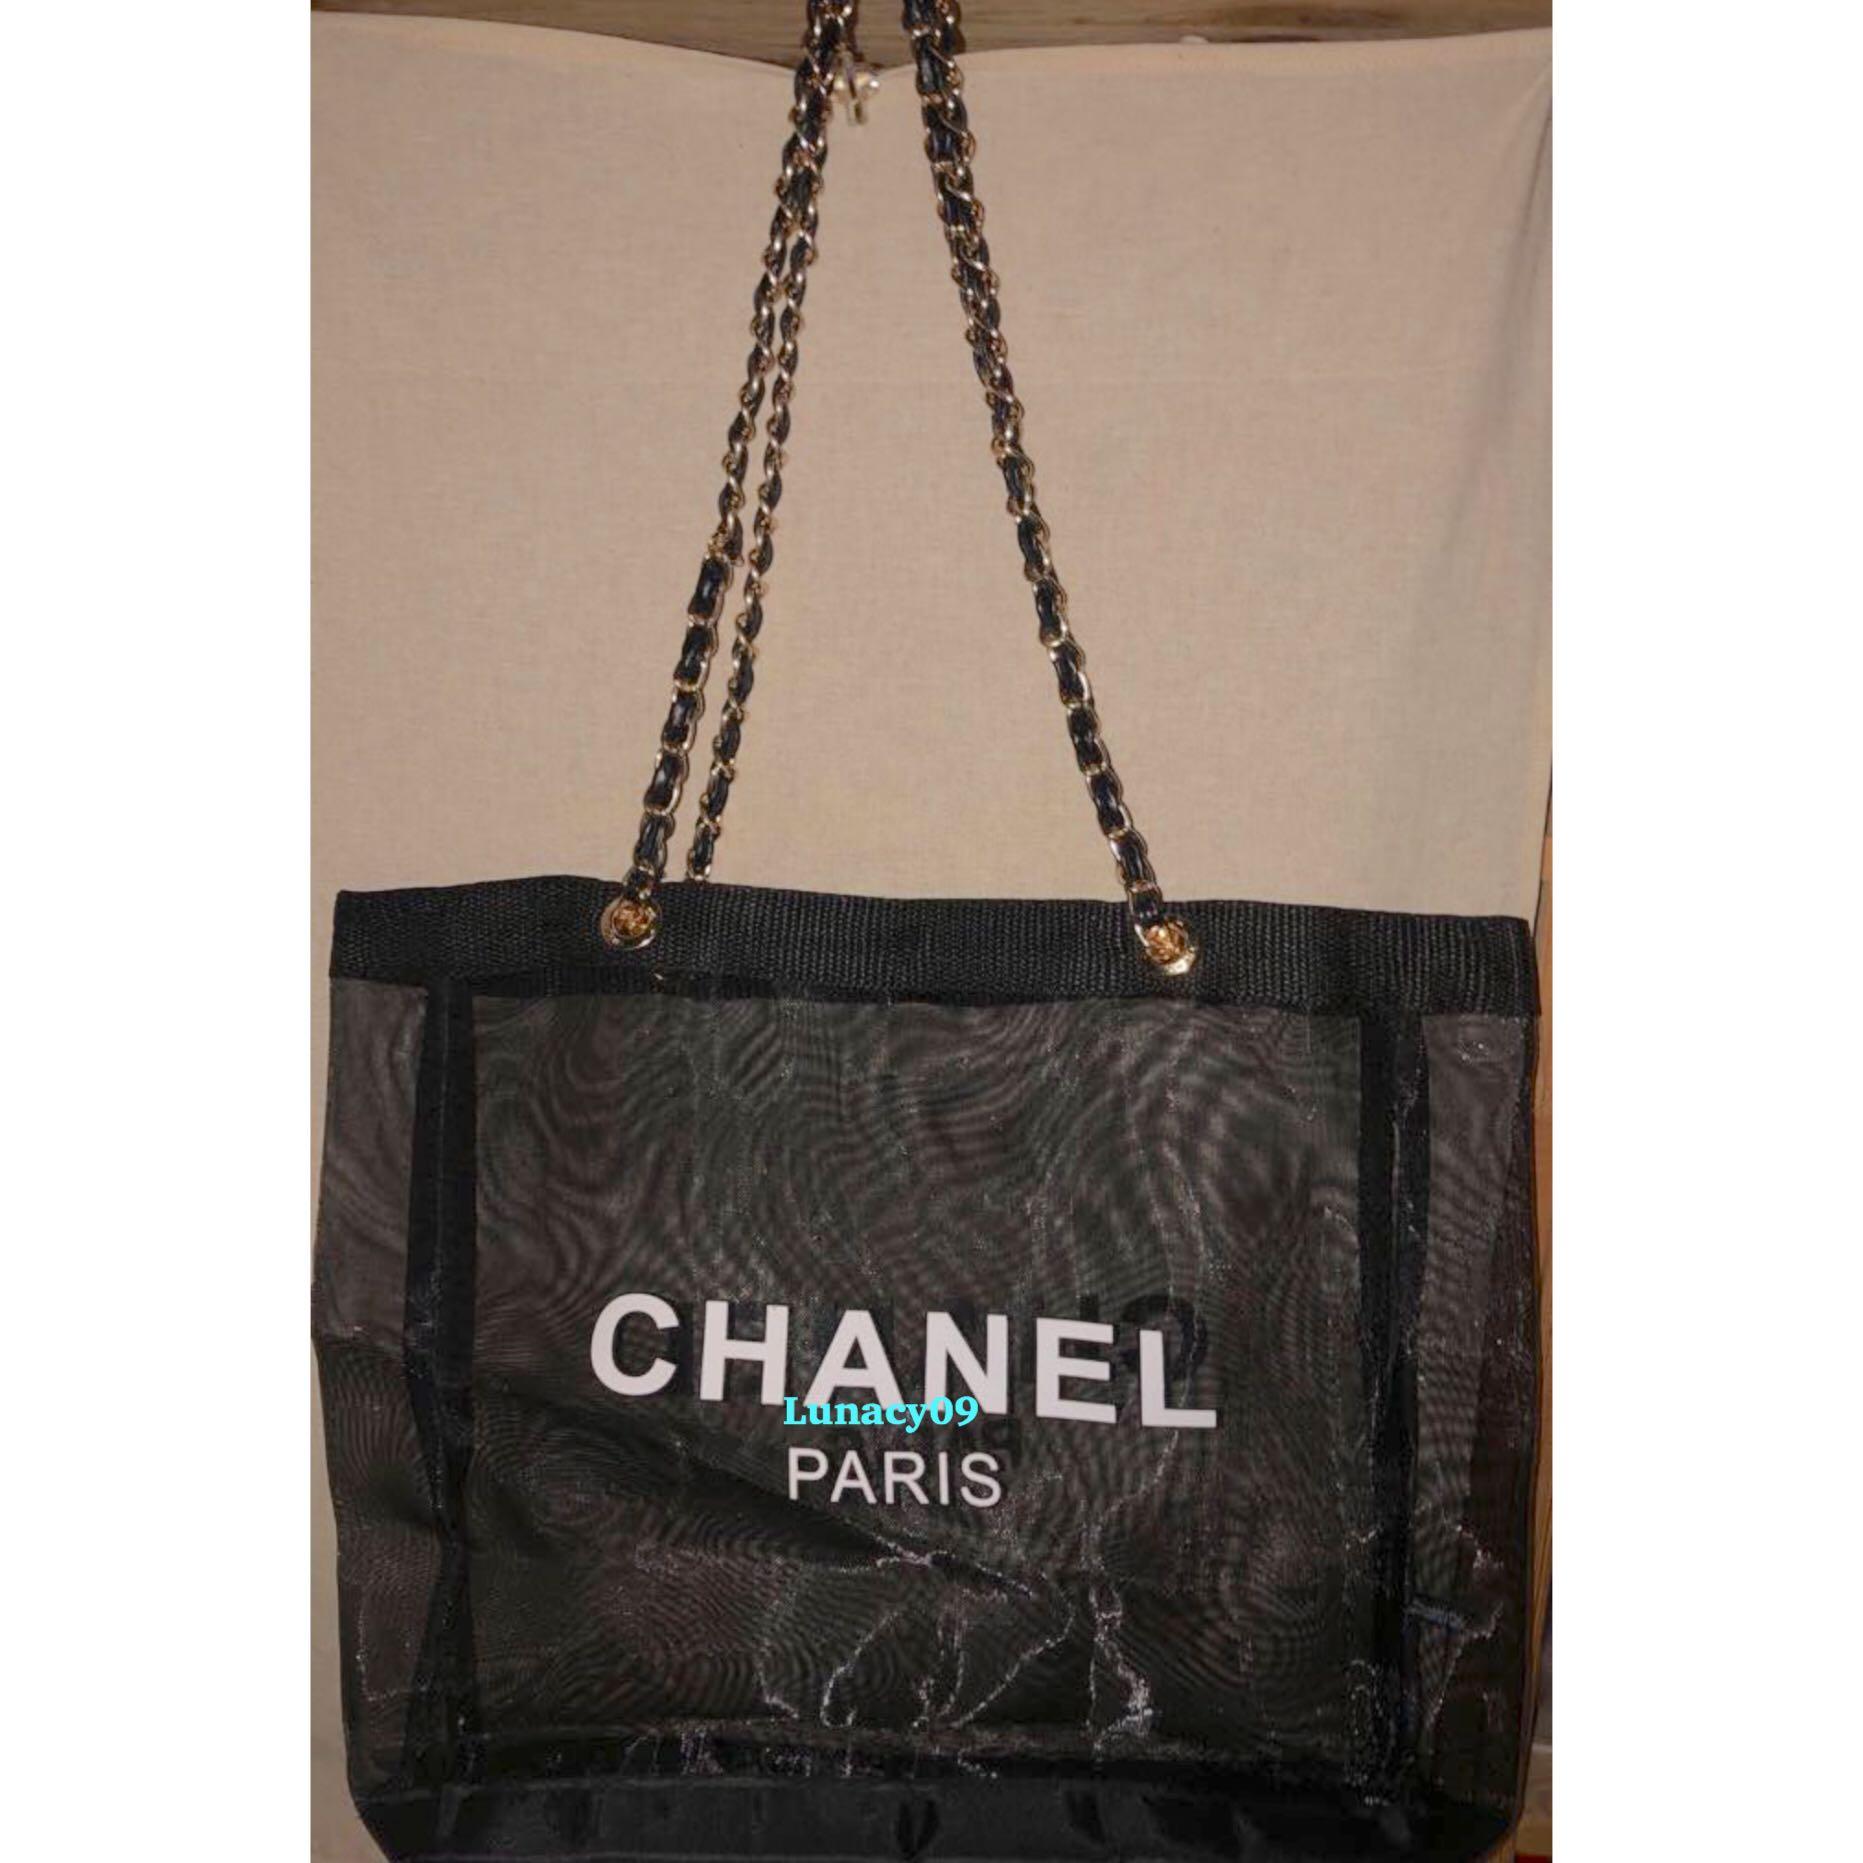 be7e4ef9fdb6cd 2019 Chanel Precision Makeup Summer Edition Mesh Tote Bag, Luxury, Bags &  Wallets, Handbags on Carousell